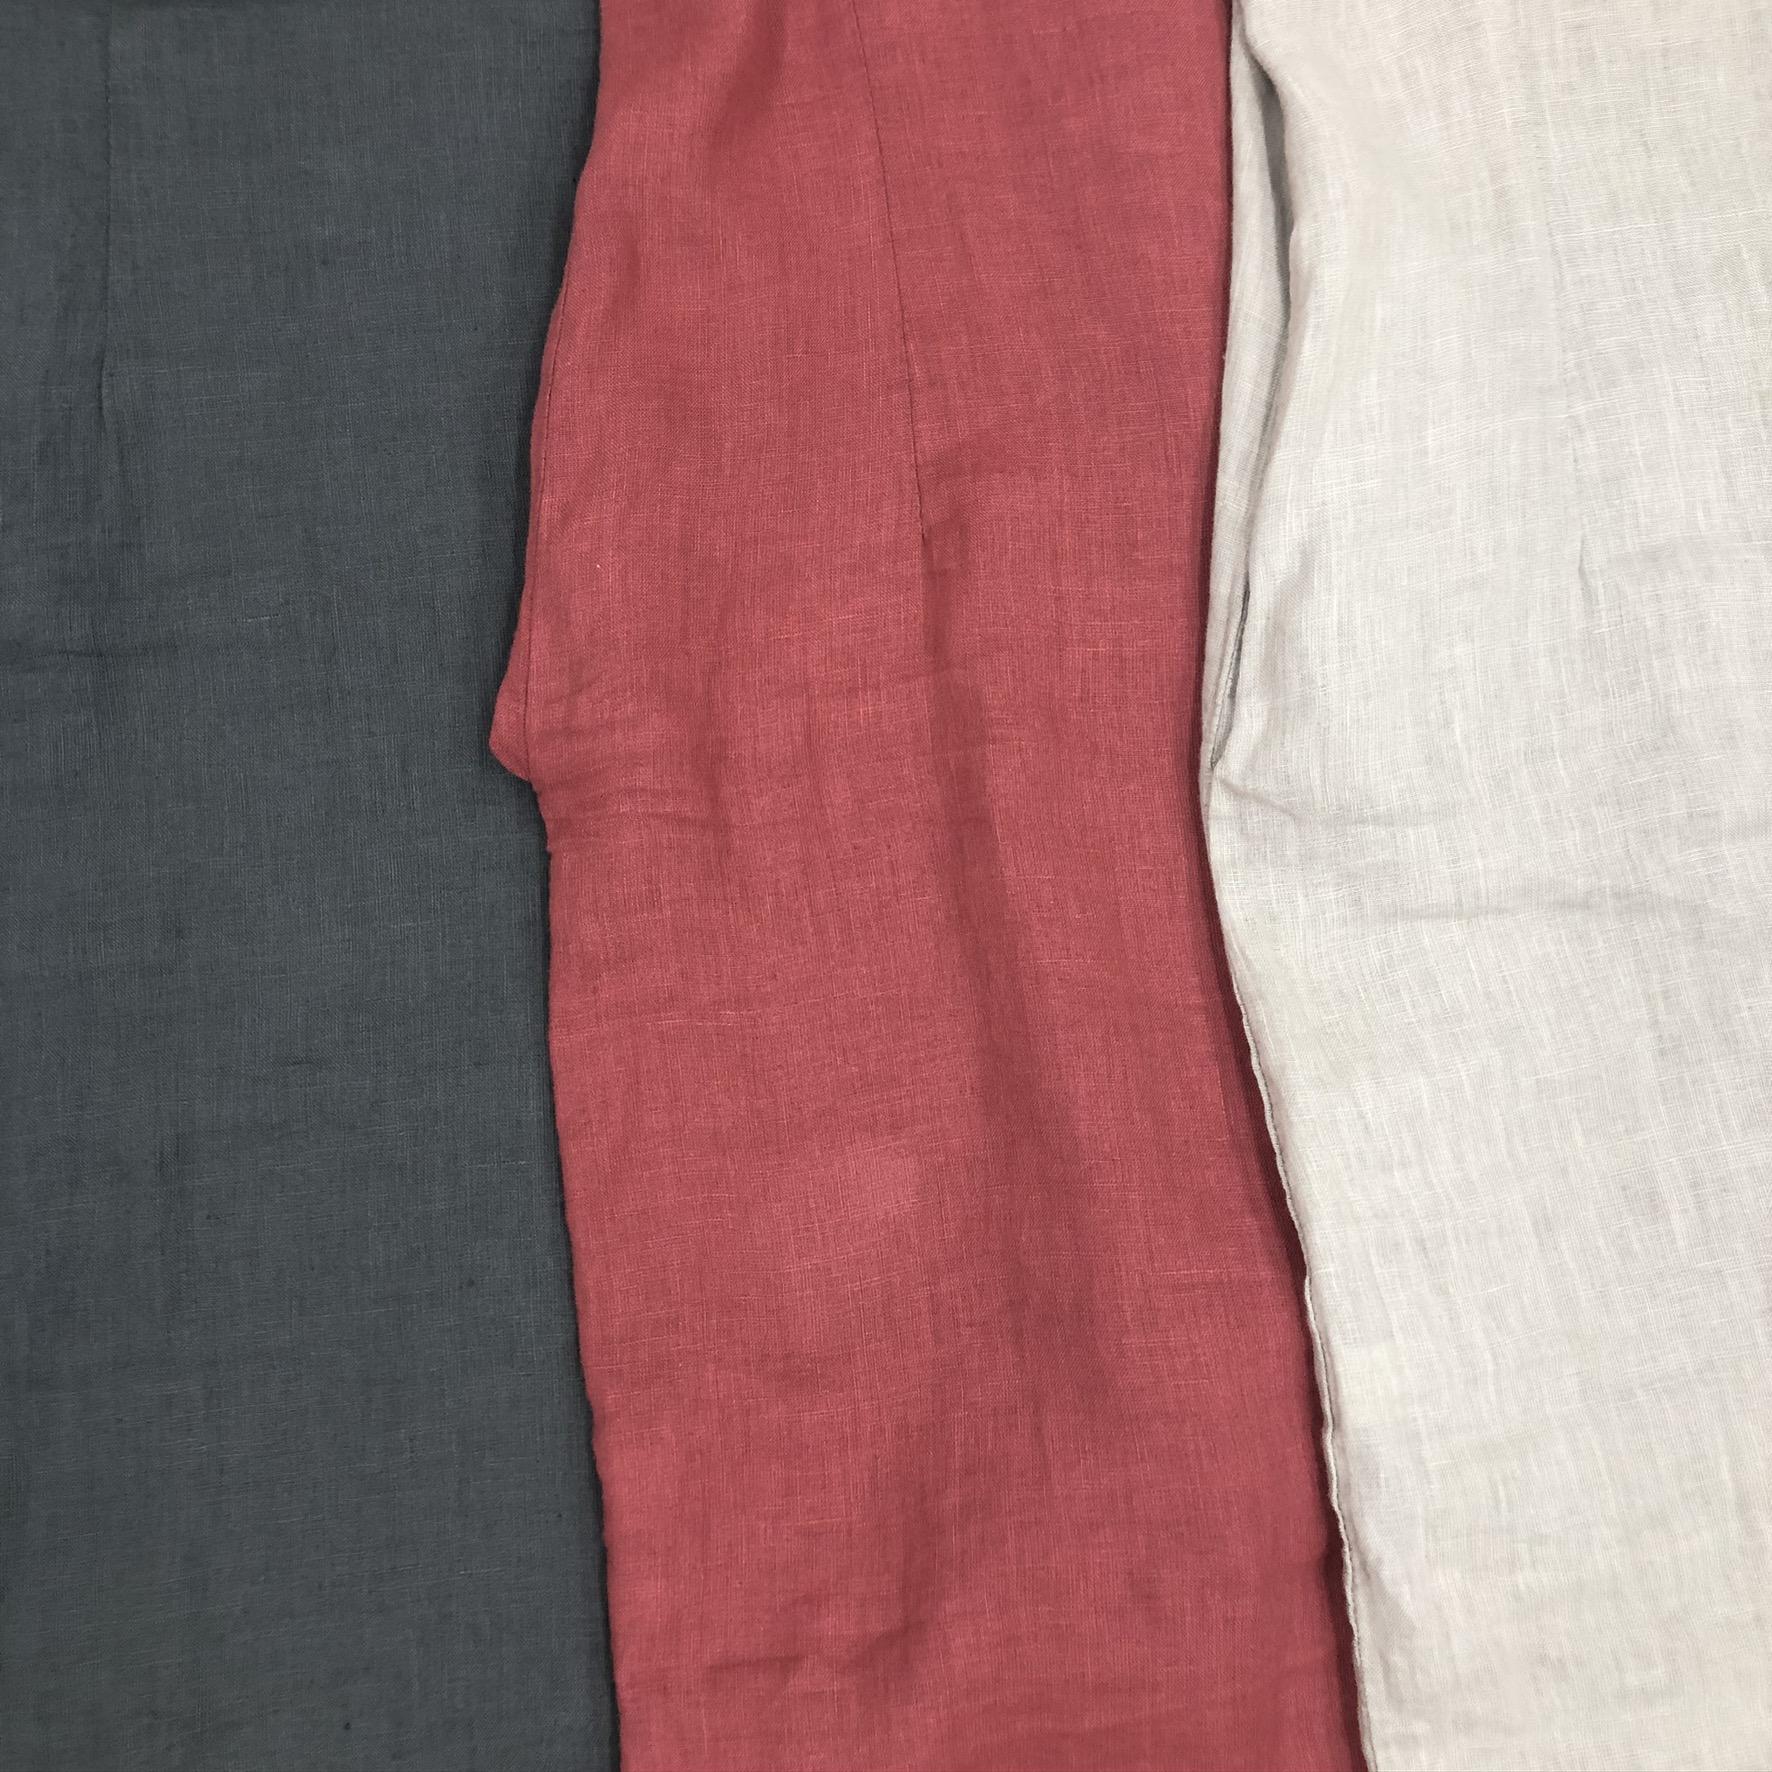 Zipper Dress Color Swatches